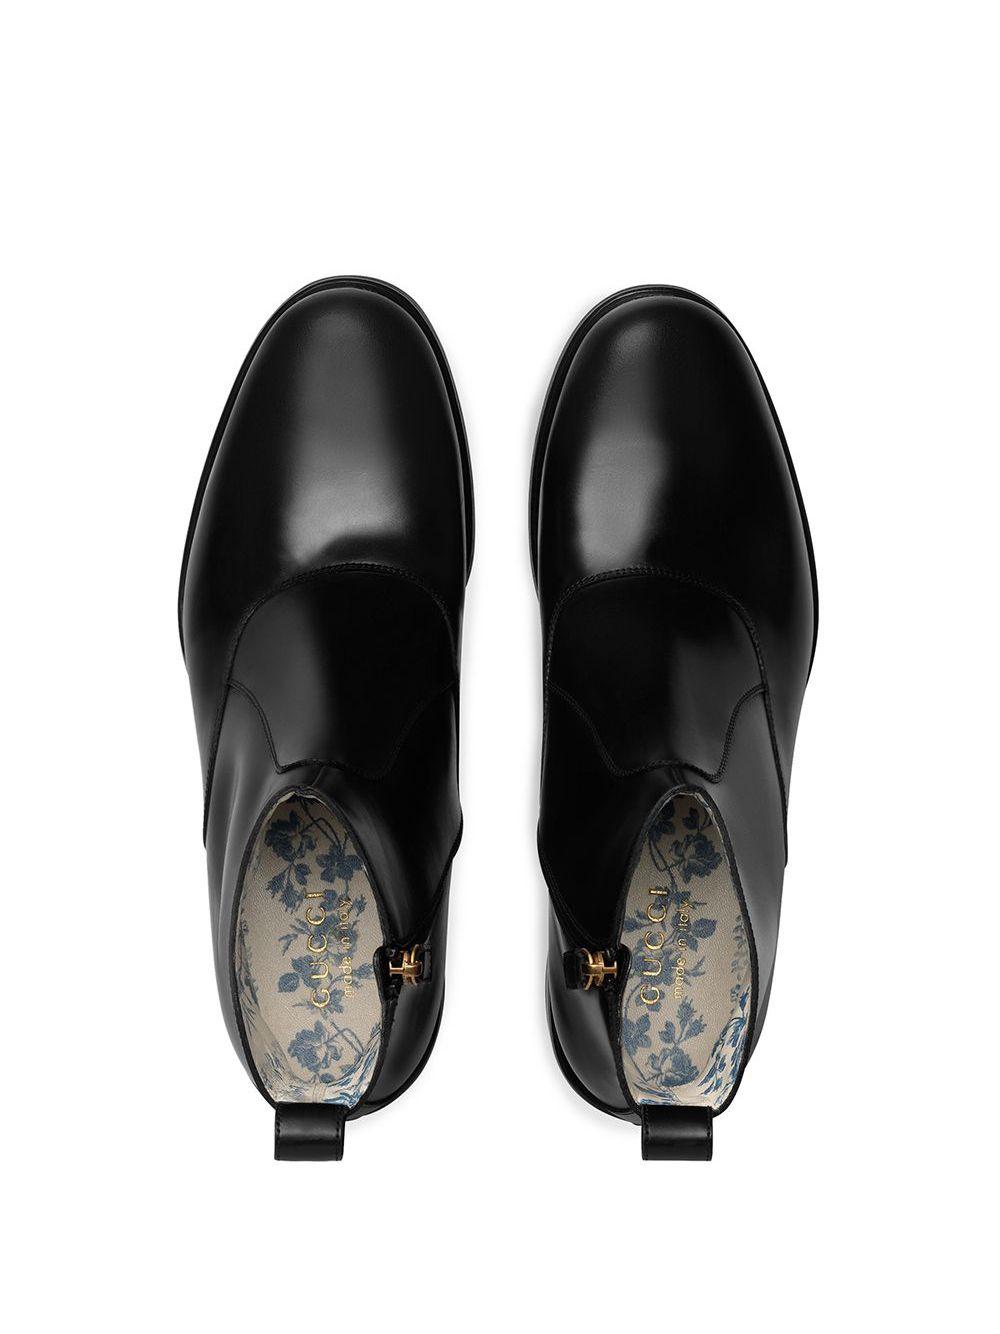 GUCCI | ботинки челси с вышивкой пчелы сзади | Clouty